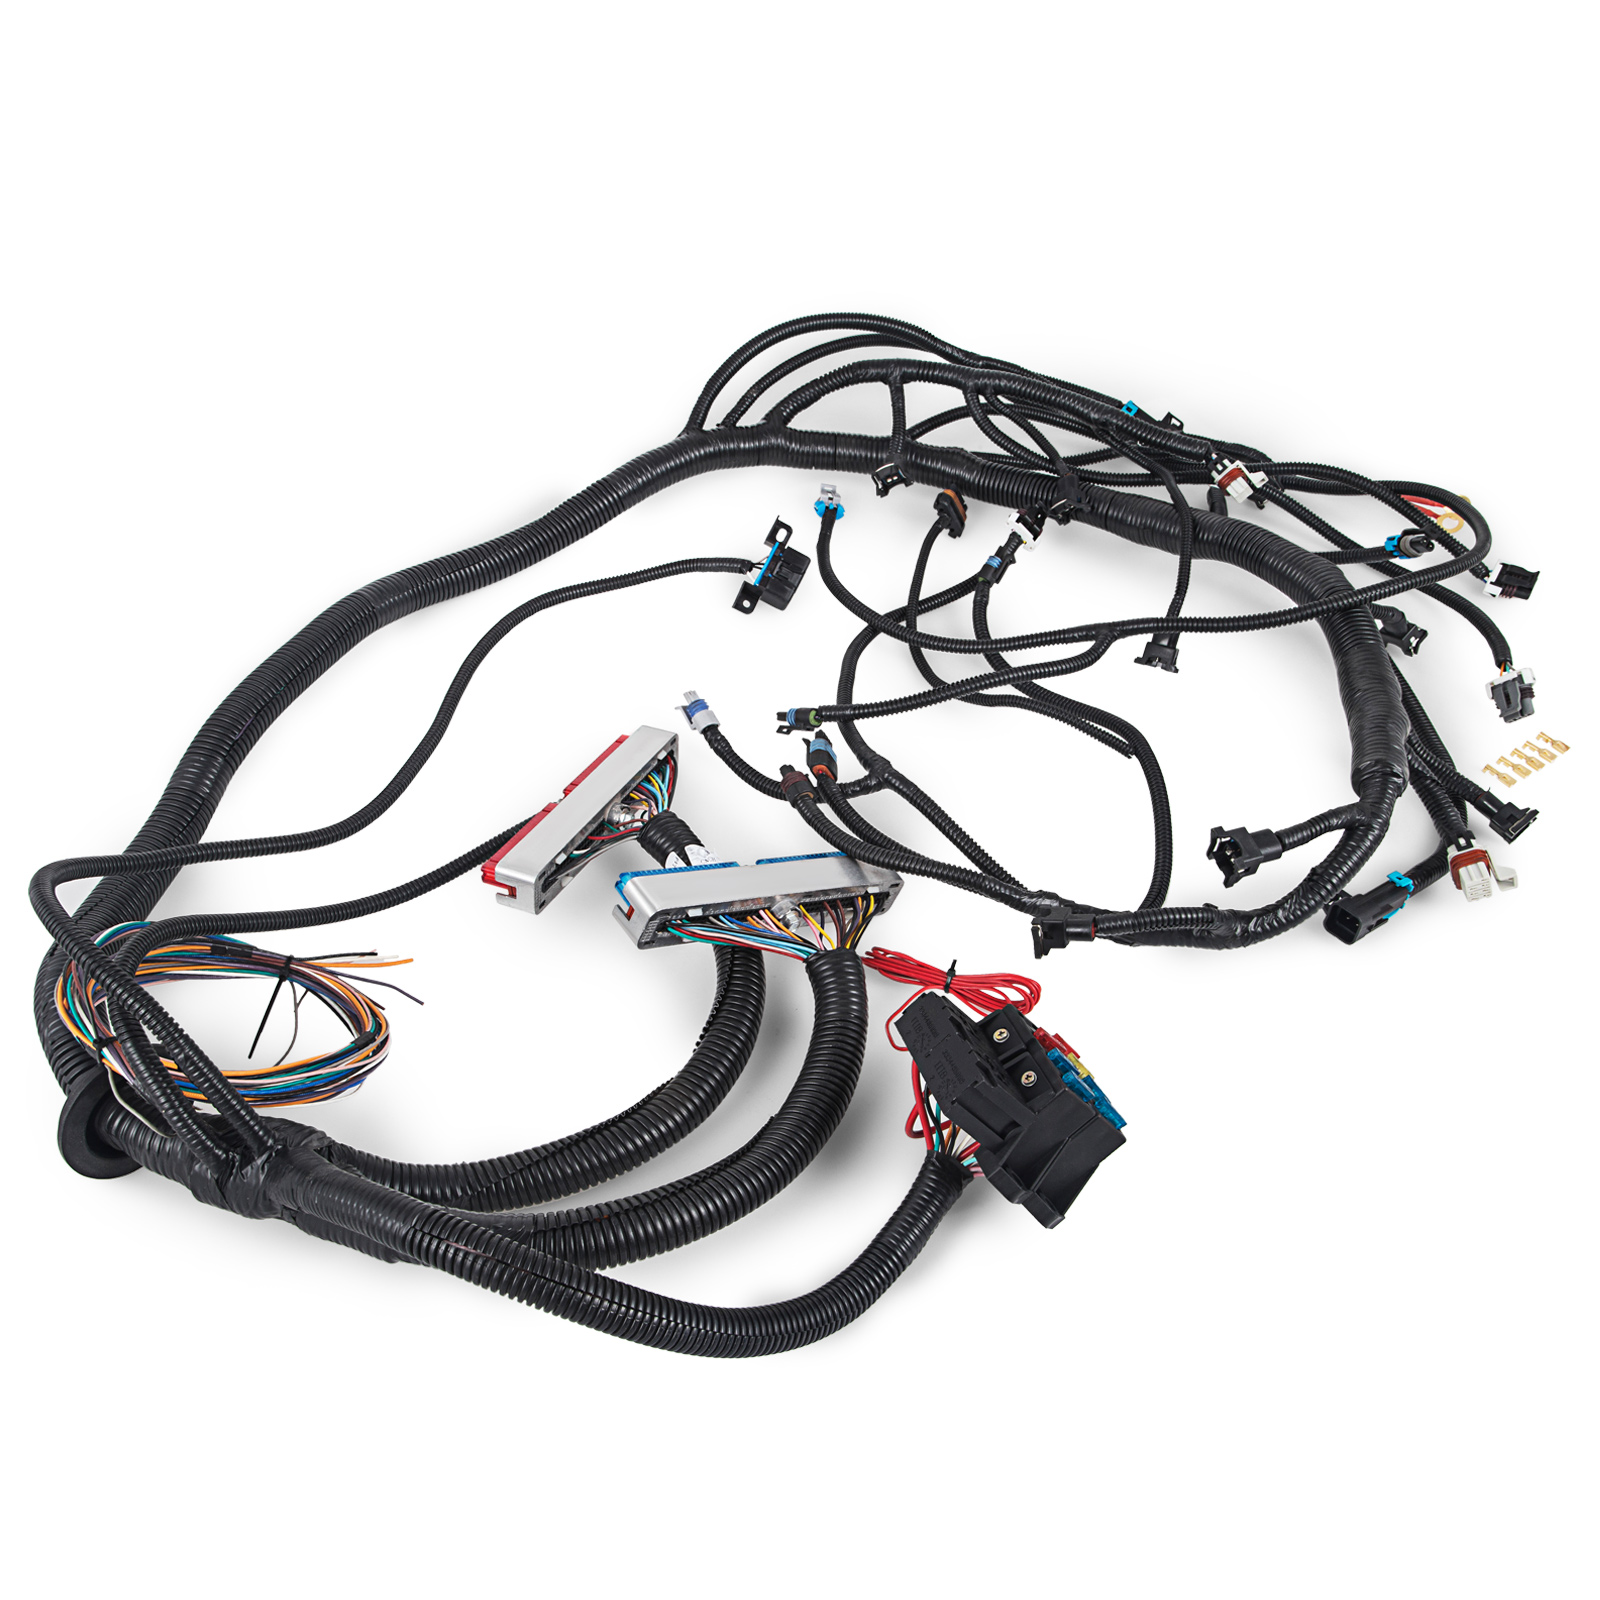 d530-3 Underhood Wiring Harness Ls on ls1 fuel rail, stock ls1 harness, ls1 engine harness, ls1 carburetor, ls1 fuel pressure regulator, ls1 wheels, ls1 swap harness, ls1 pulley, ls1 fuel line, 2000 ls1 harness, ls1 brakes, ls1 power steering pump, ls1 ignition wire terminals, 68 camaro ls1 wire harness, ls1 exhaust, ls1 fuel filter, custom ls1 harness, ls1 oil cooler, ls1 driveshaft,